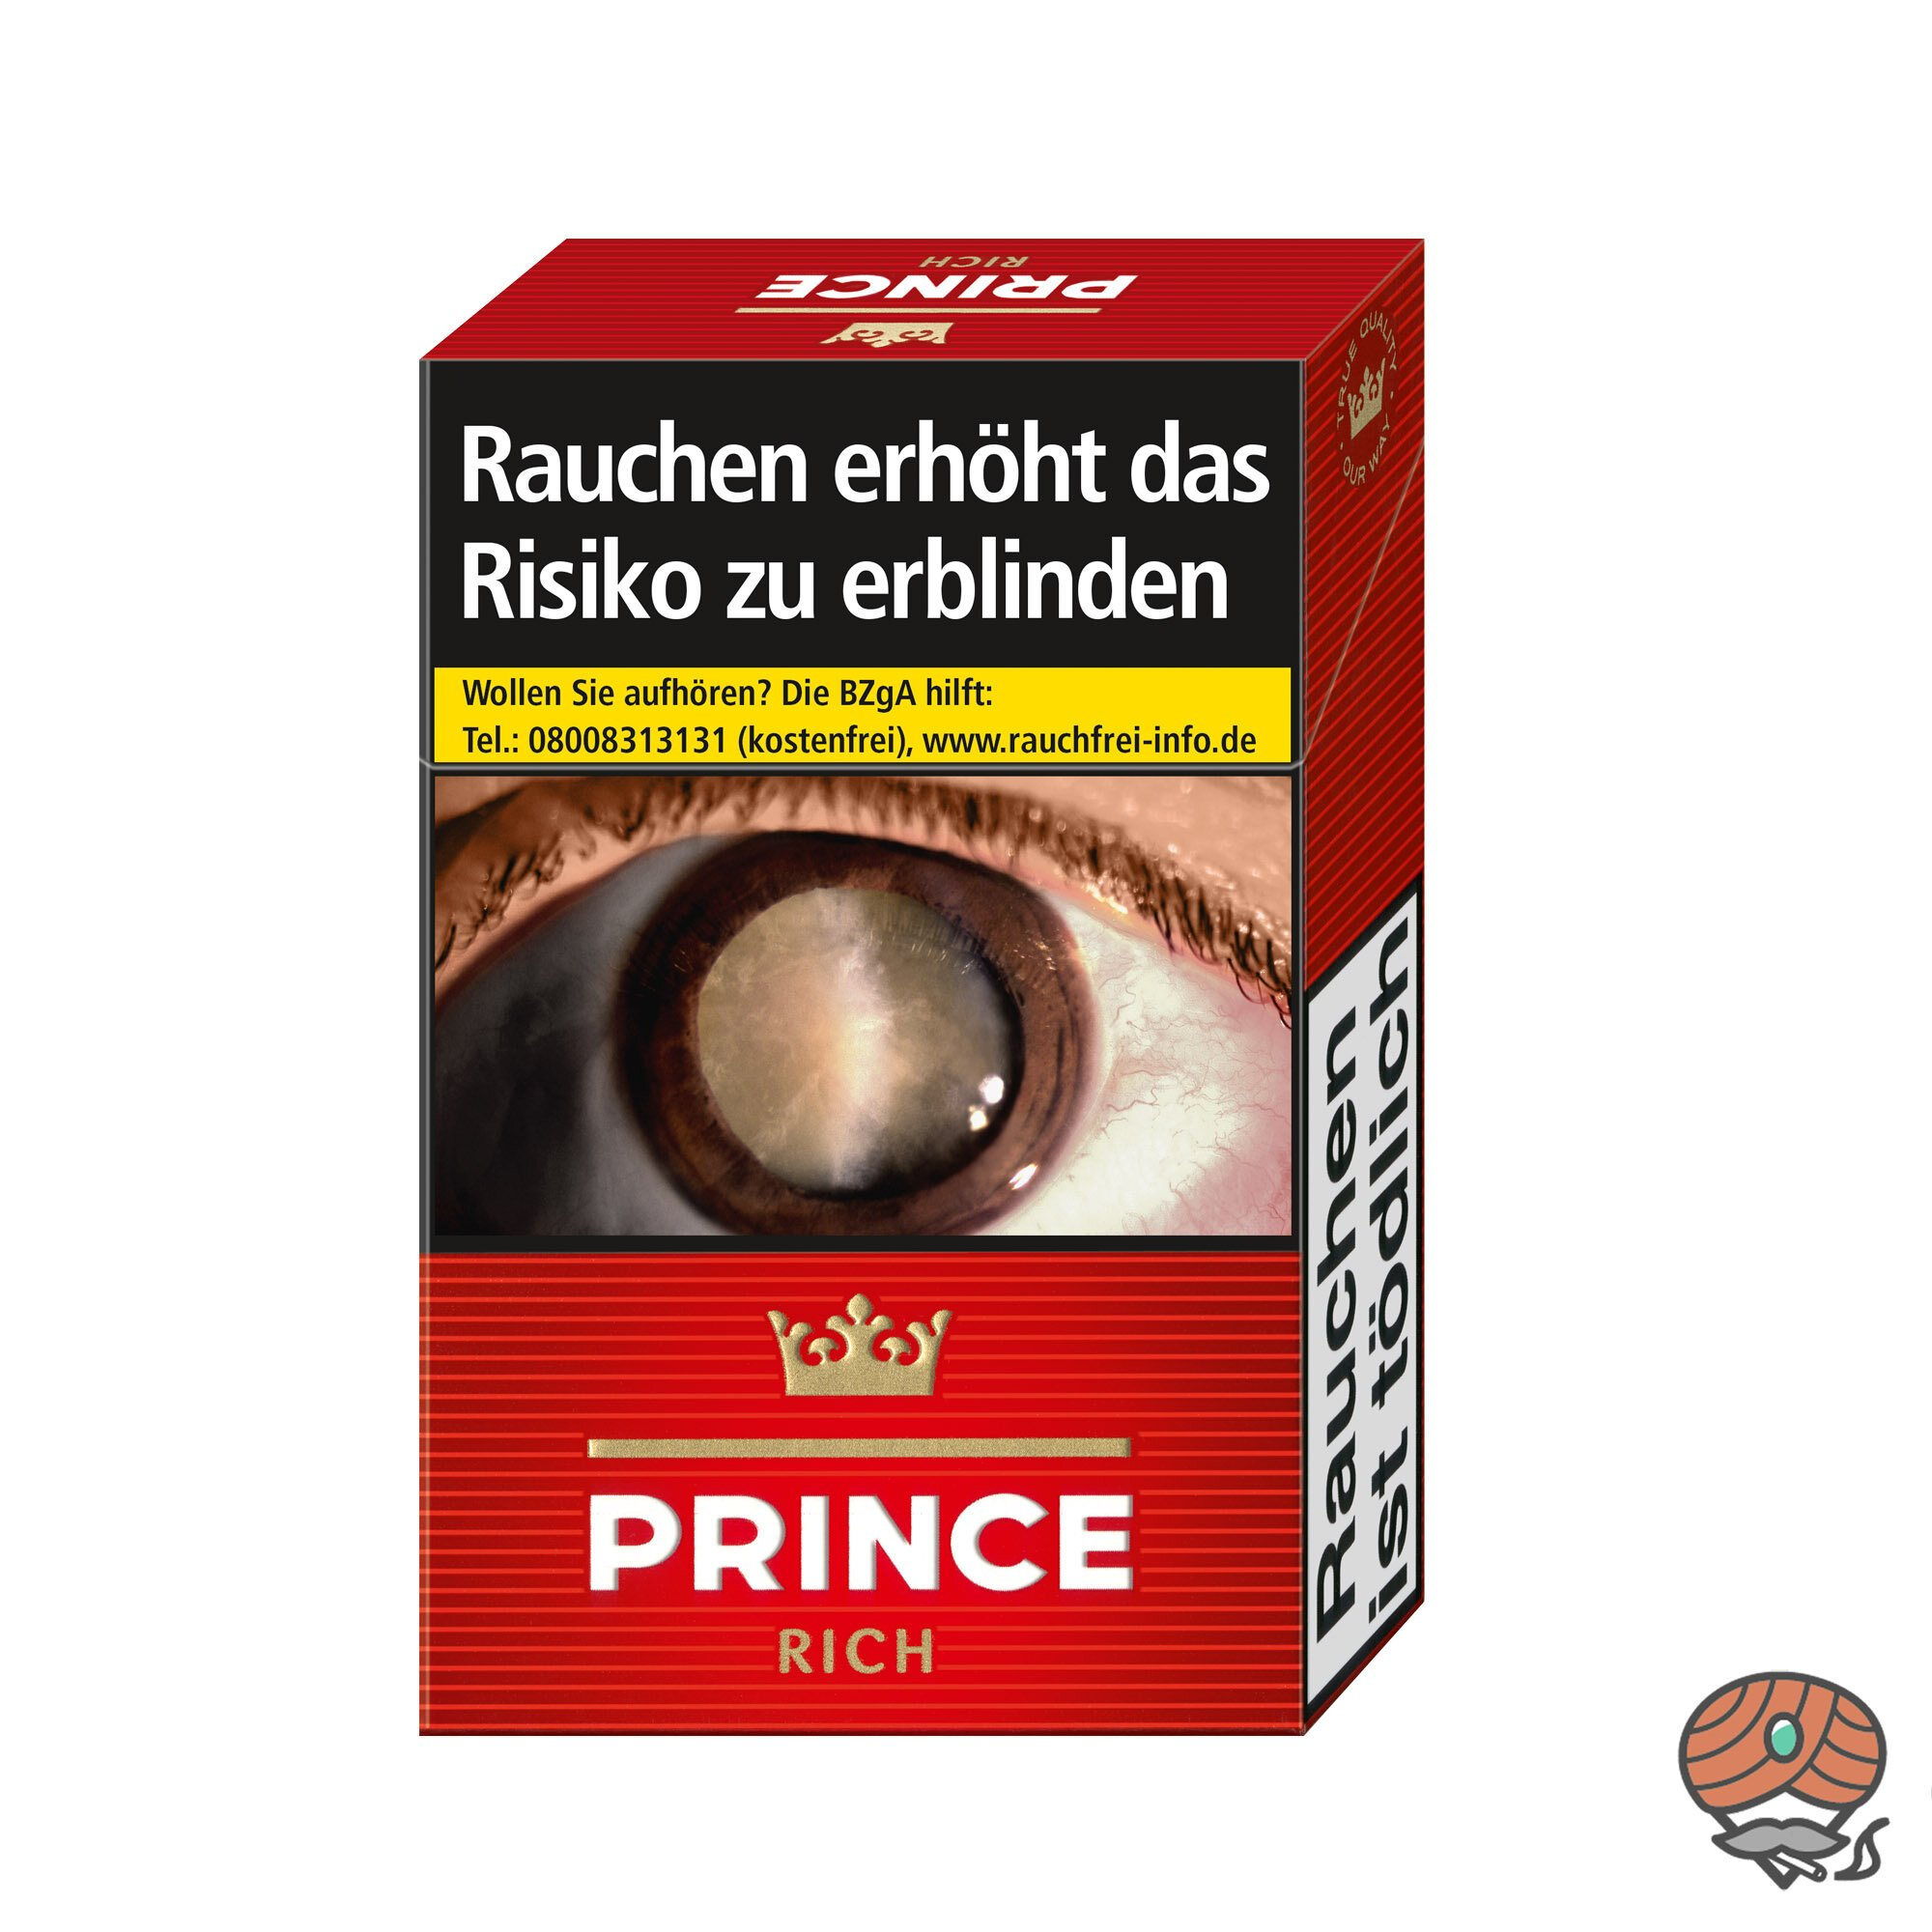 Prince Rich / Red Zigaretten Inhalt 20 Stück